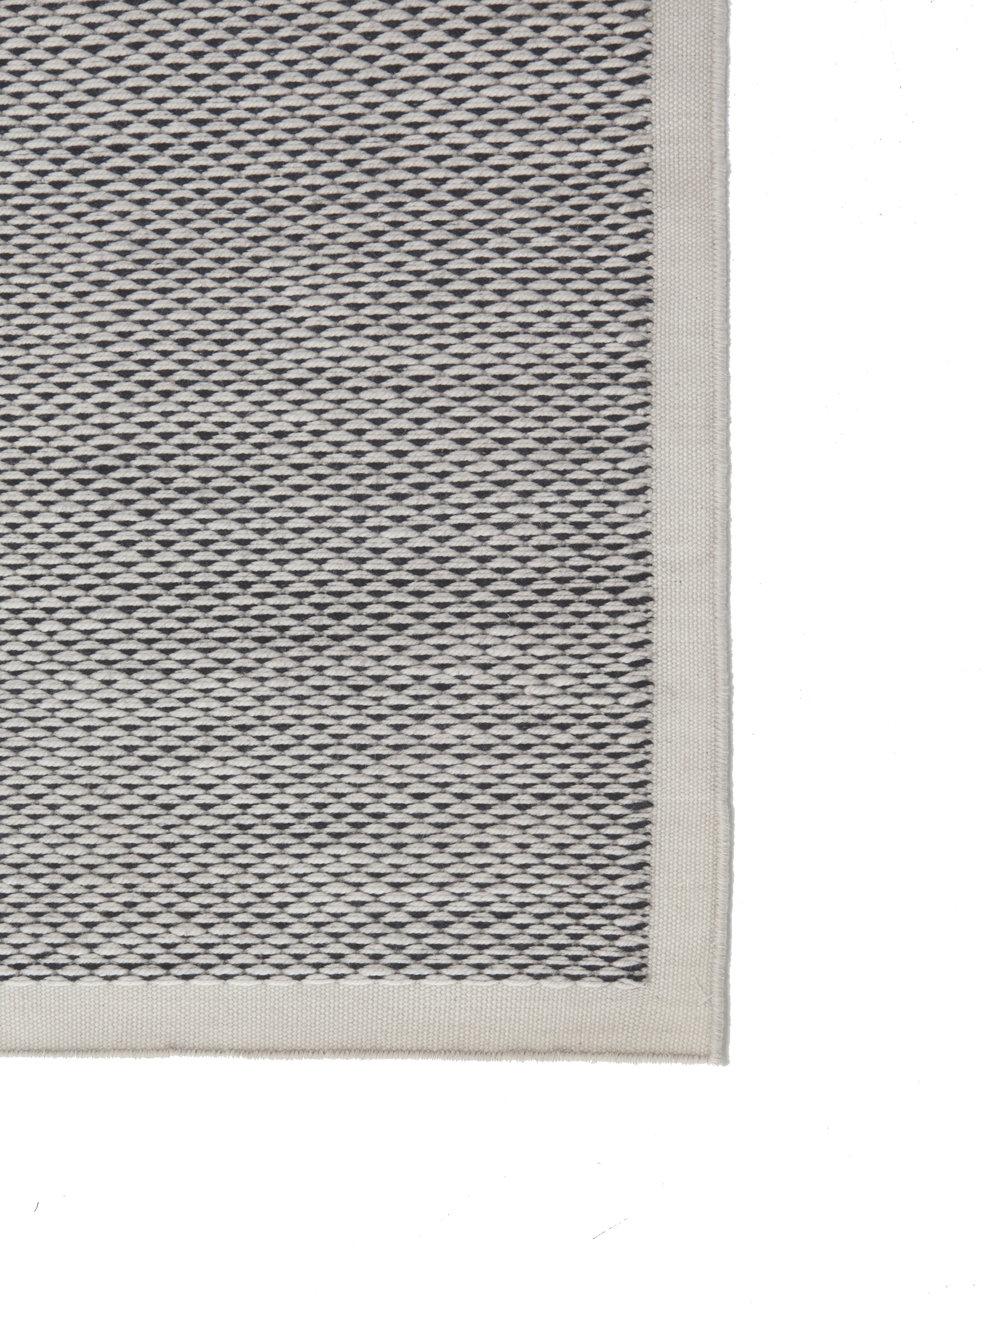 FELLS-ANDES-LYXX-RUG-DETAIL-MERINO-HI-RES-WHITE.jpg